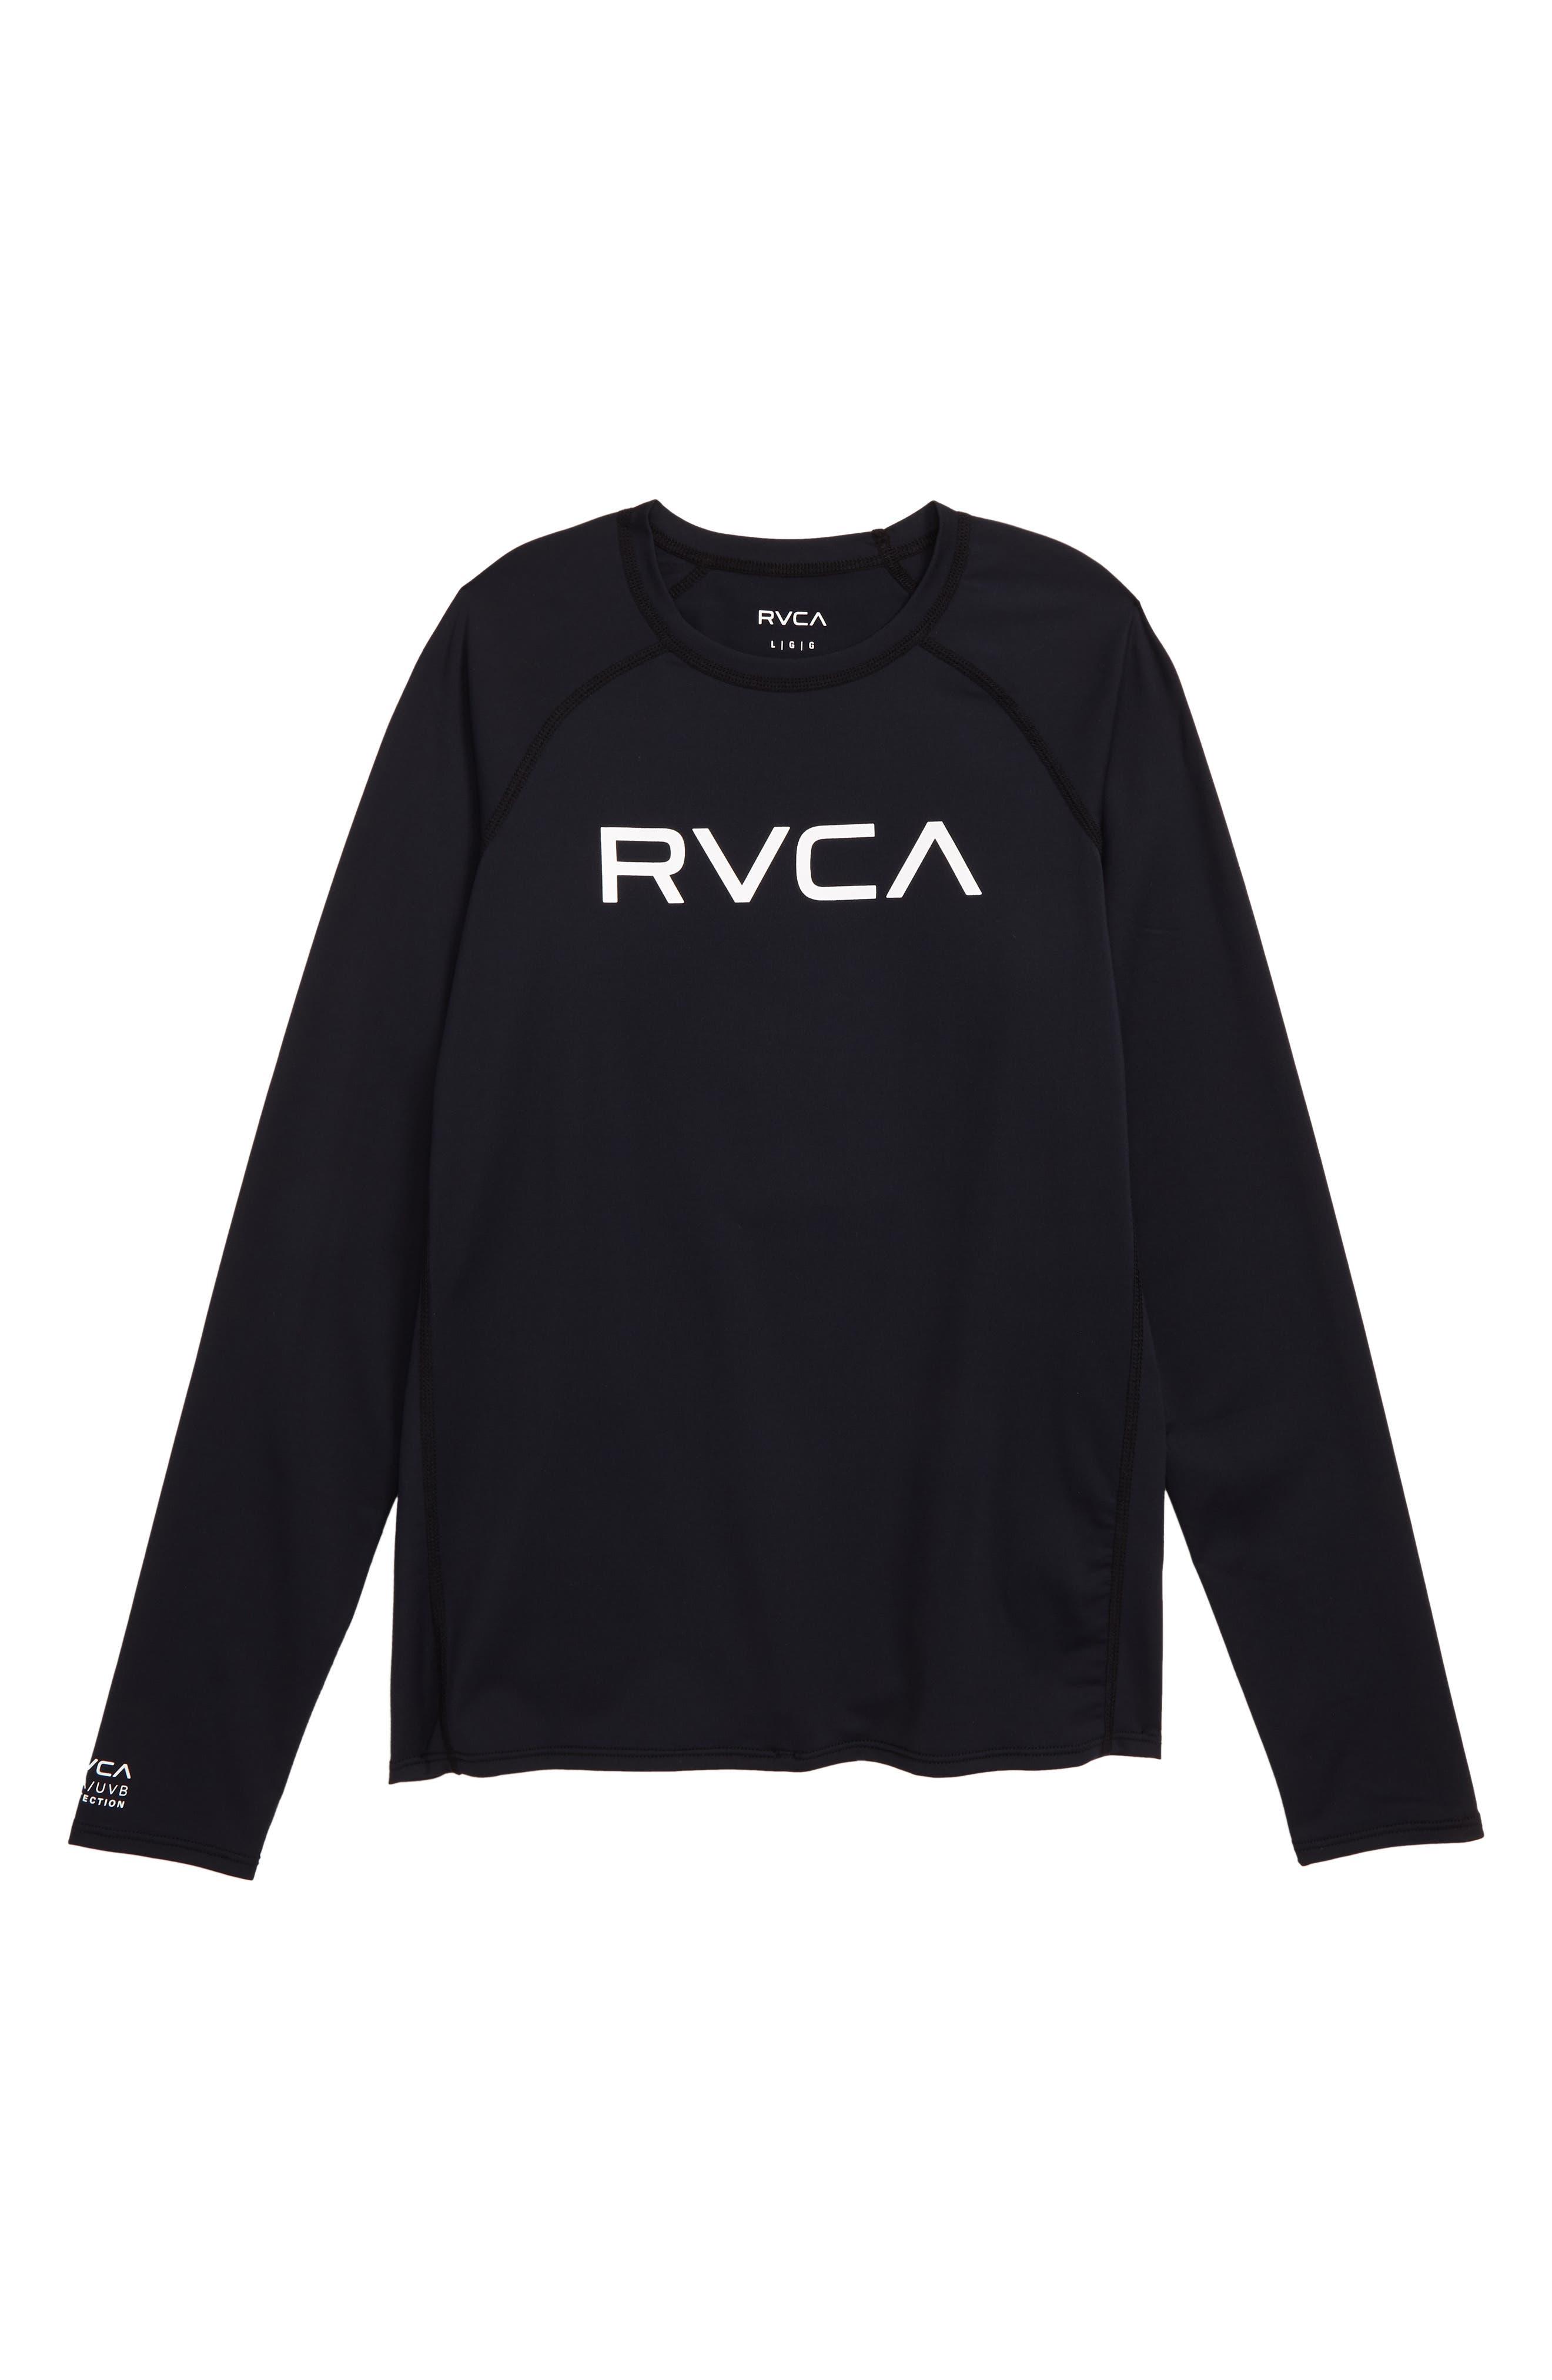 RVCA Long Sleeve Rashguard, Main, color, BLACK/ WHITE